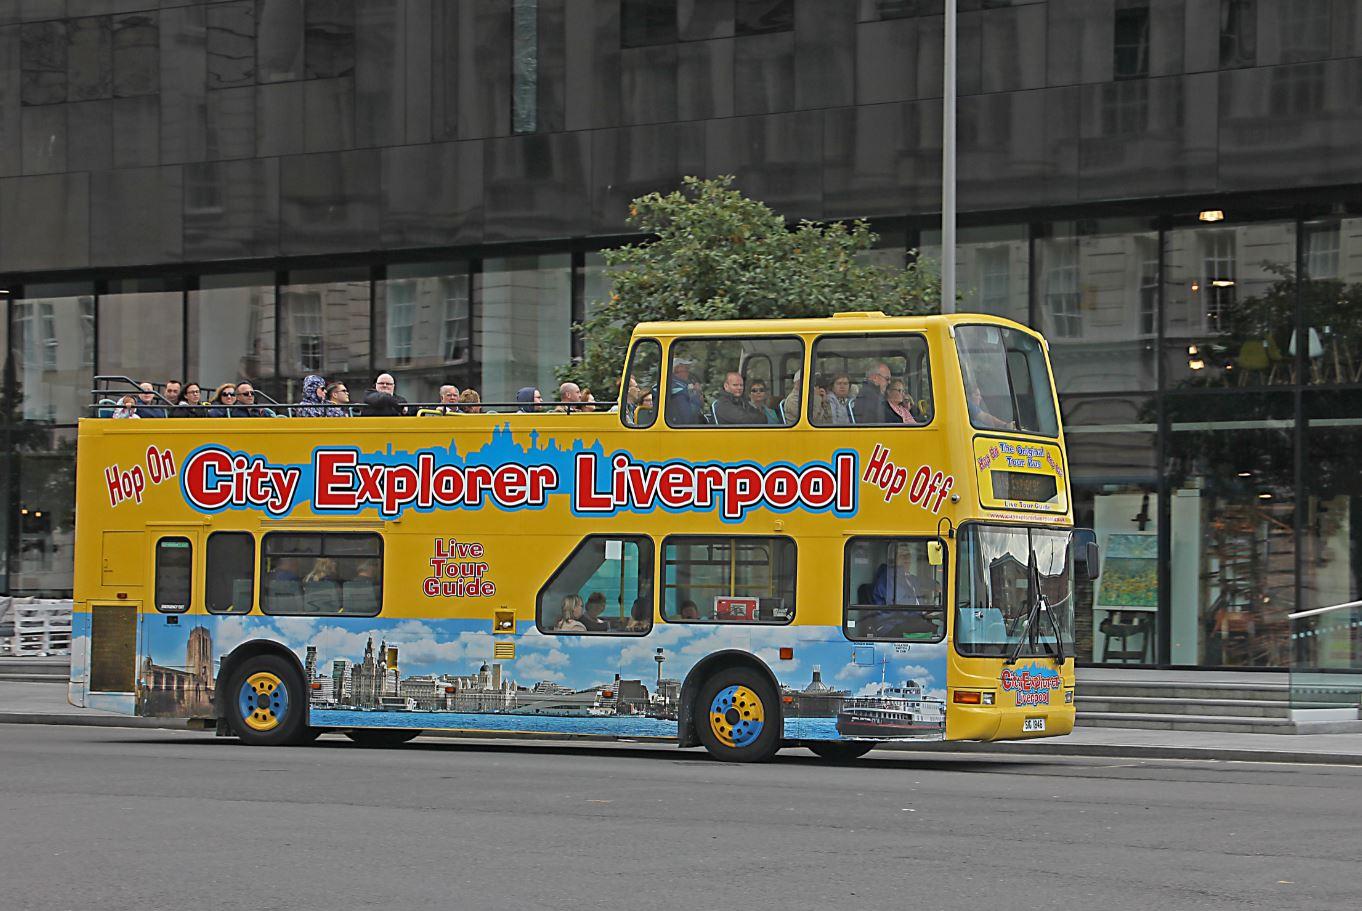 The City Explorer Liverpool Tour Bus